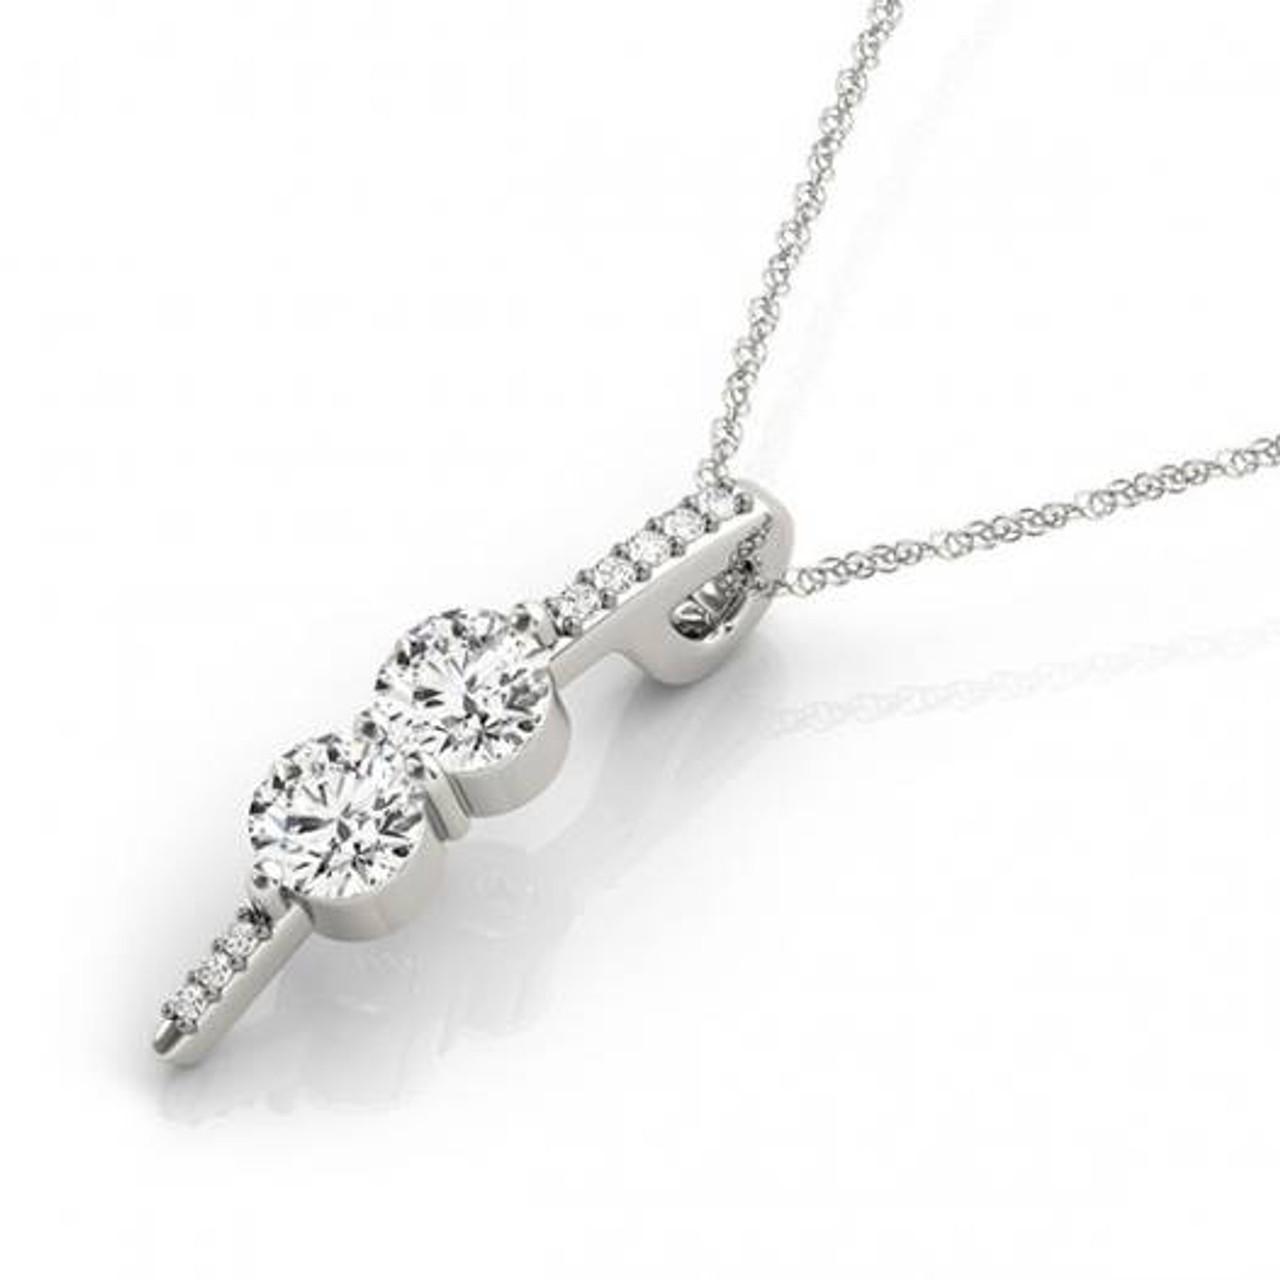 Forever us two stone genuine diamond pendant 12 carat 10k white forever us two stone genuine diamond pendant 12 carat 10k white gold 18 chain h i i1 aloadofball Gallery